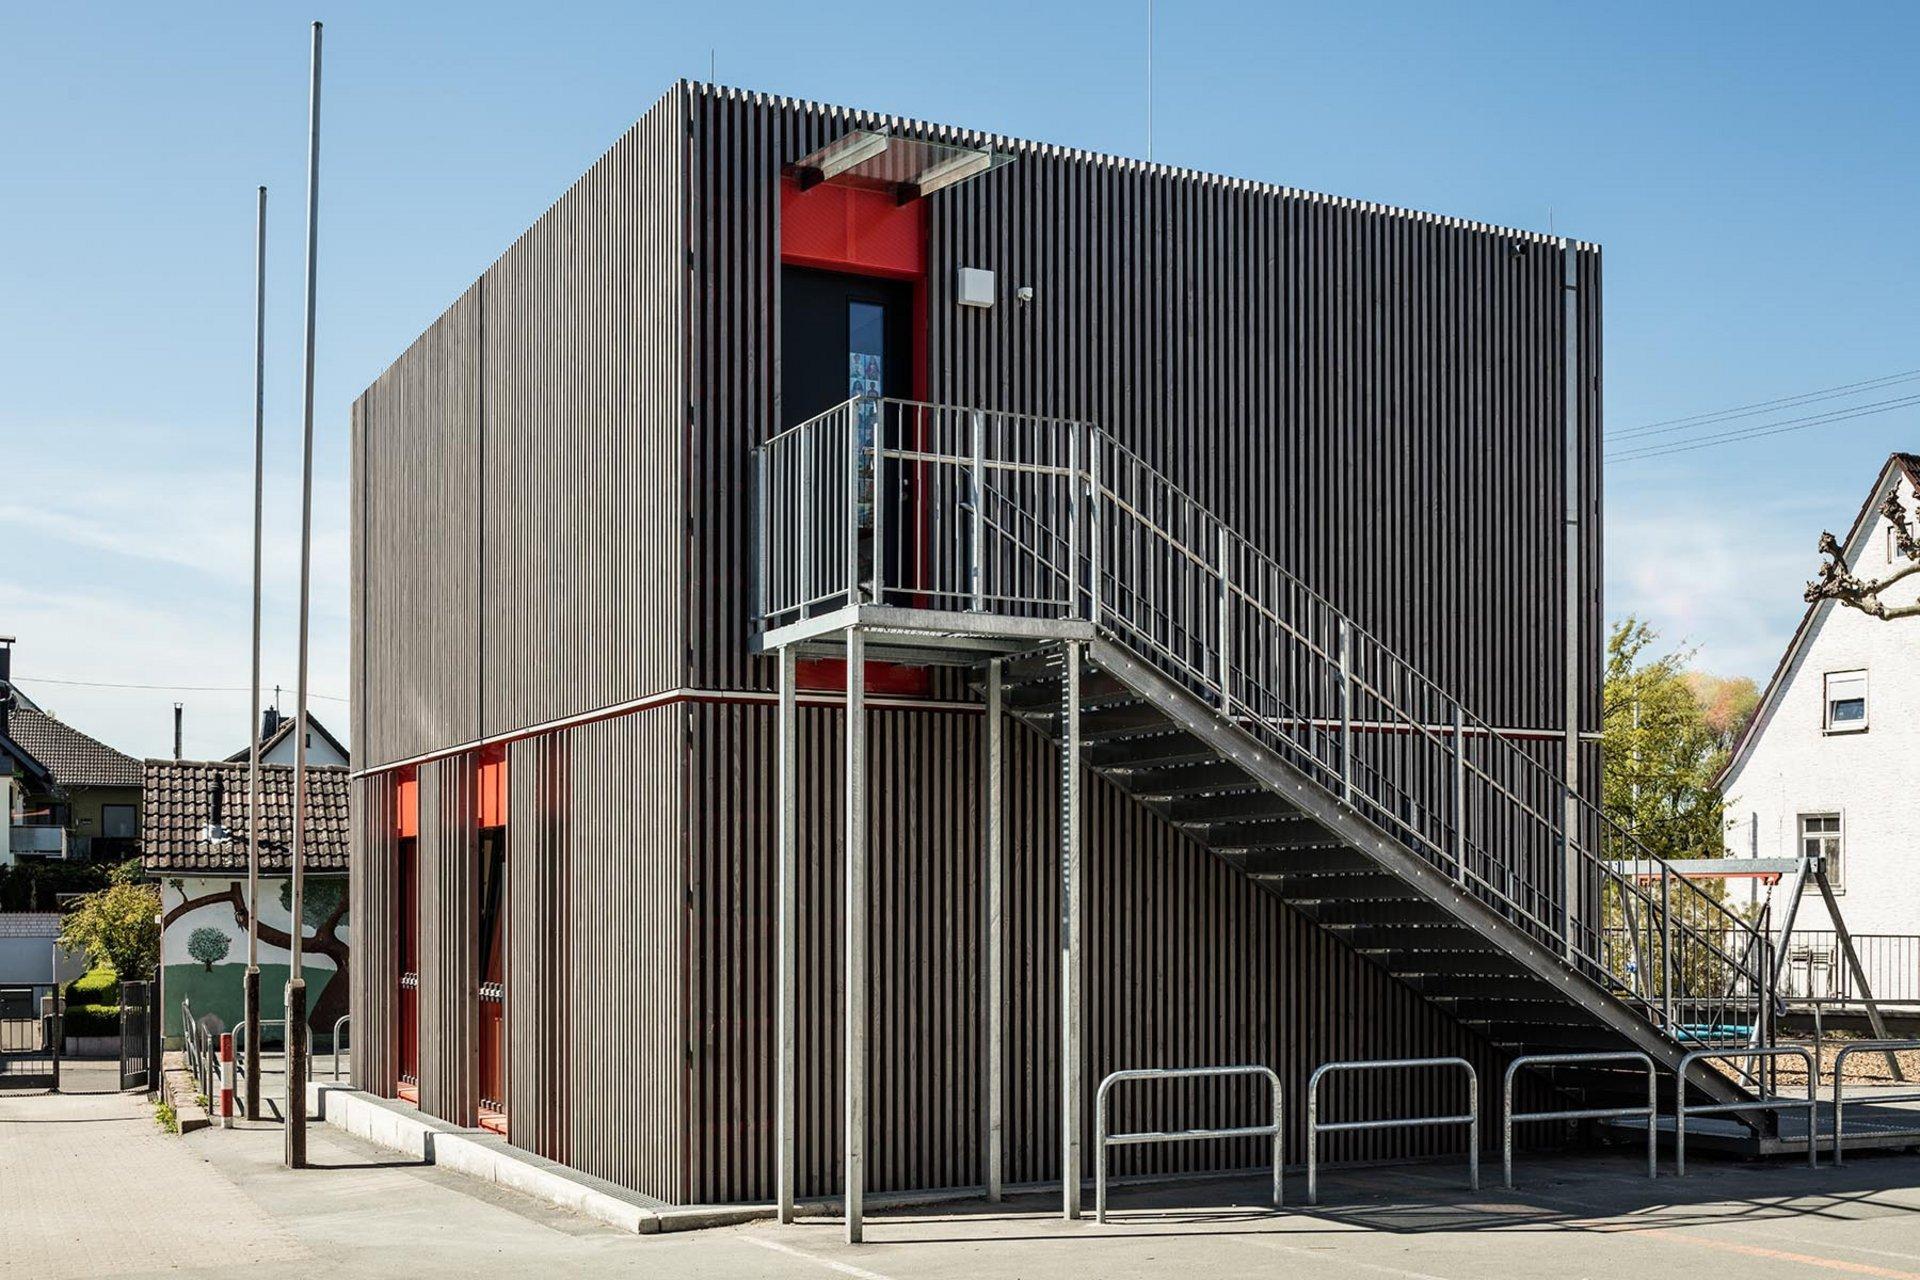 2-geschossiges Schulgebäude mit Aussenzugang zum 2. Geschoss